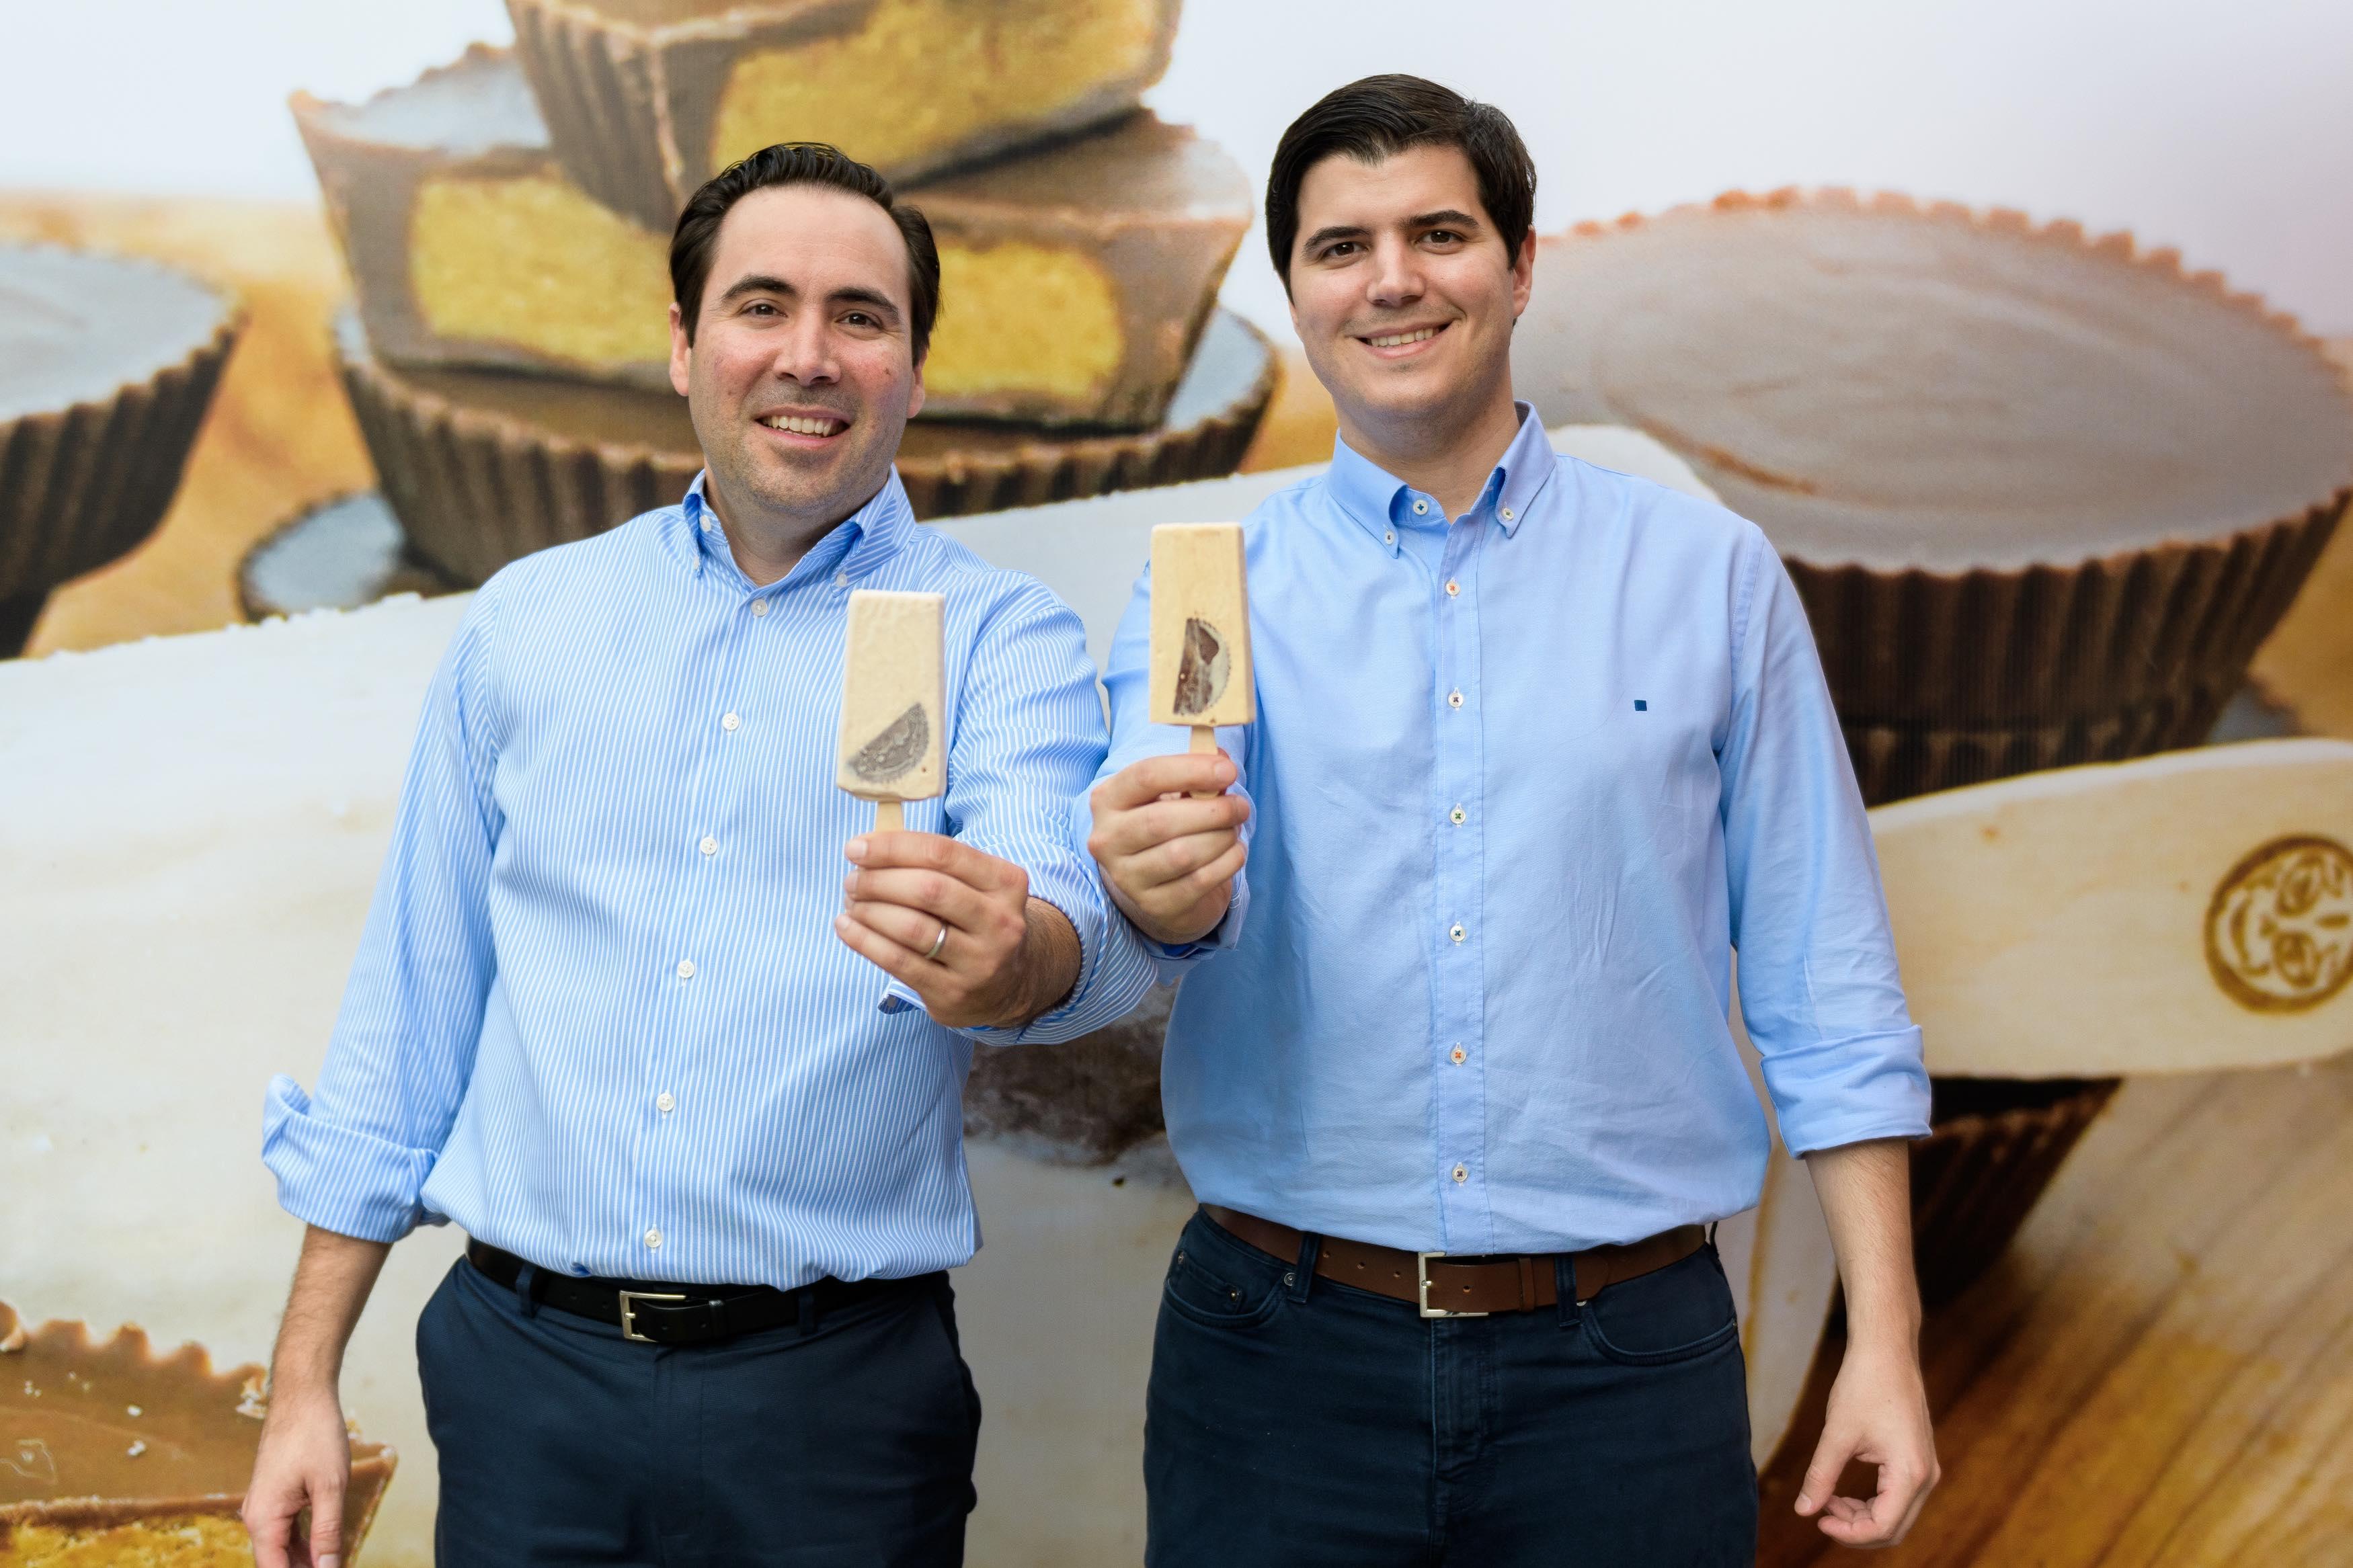 1.1 José Vela & Javier Elias